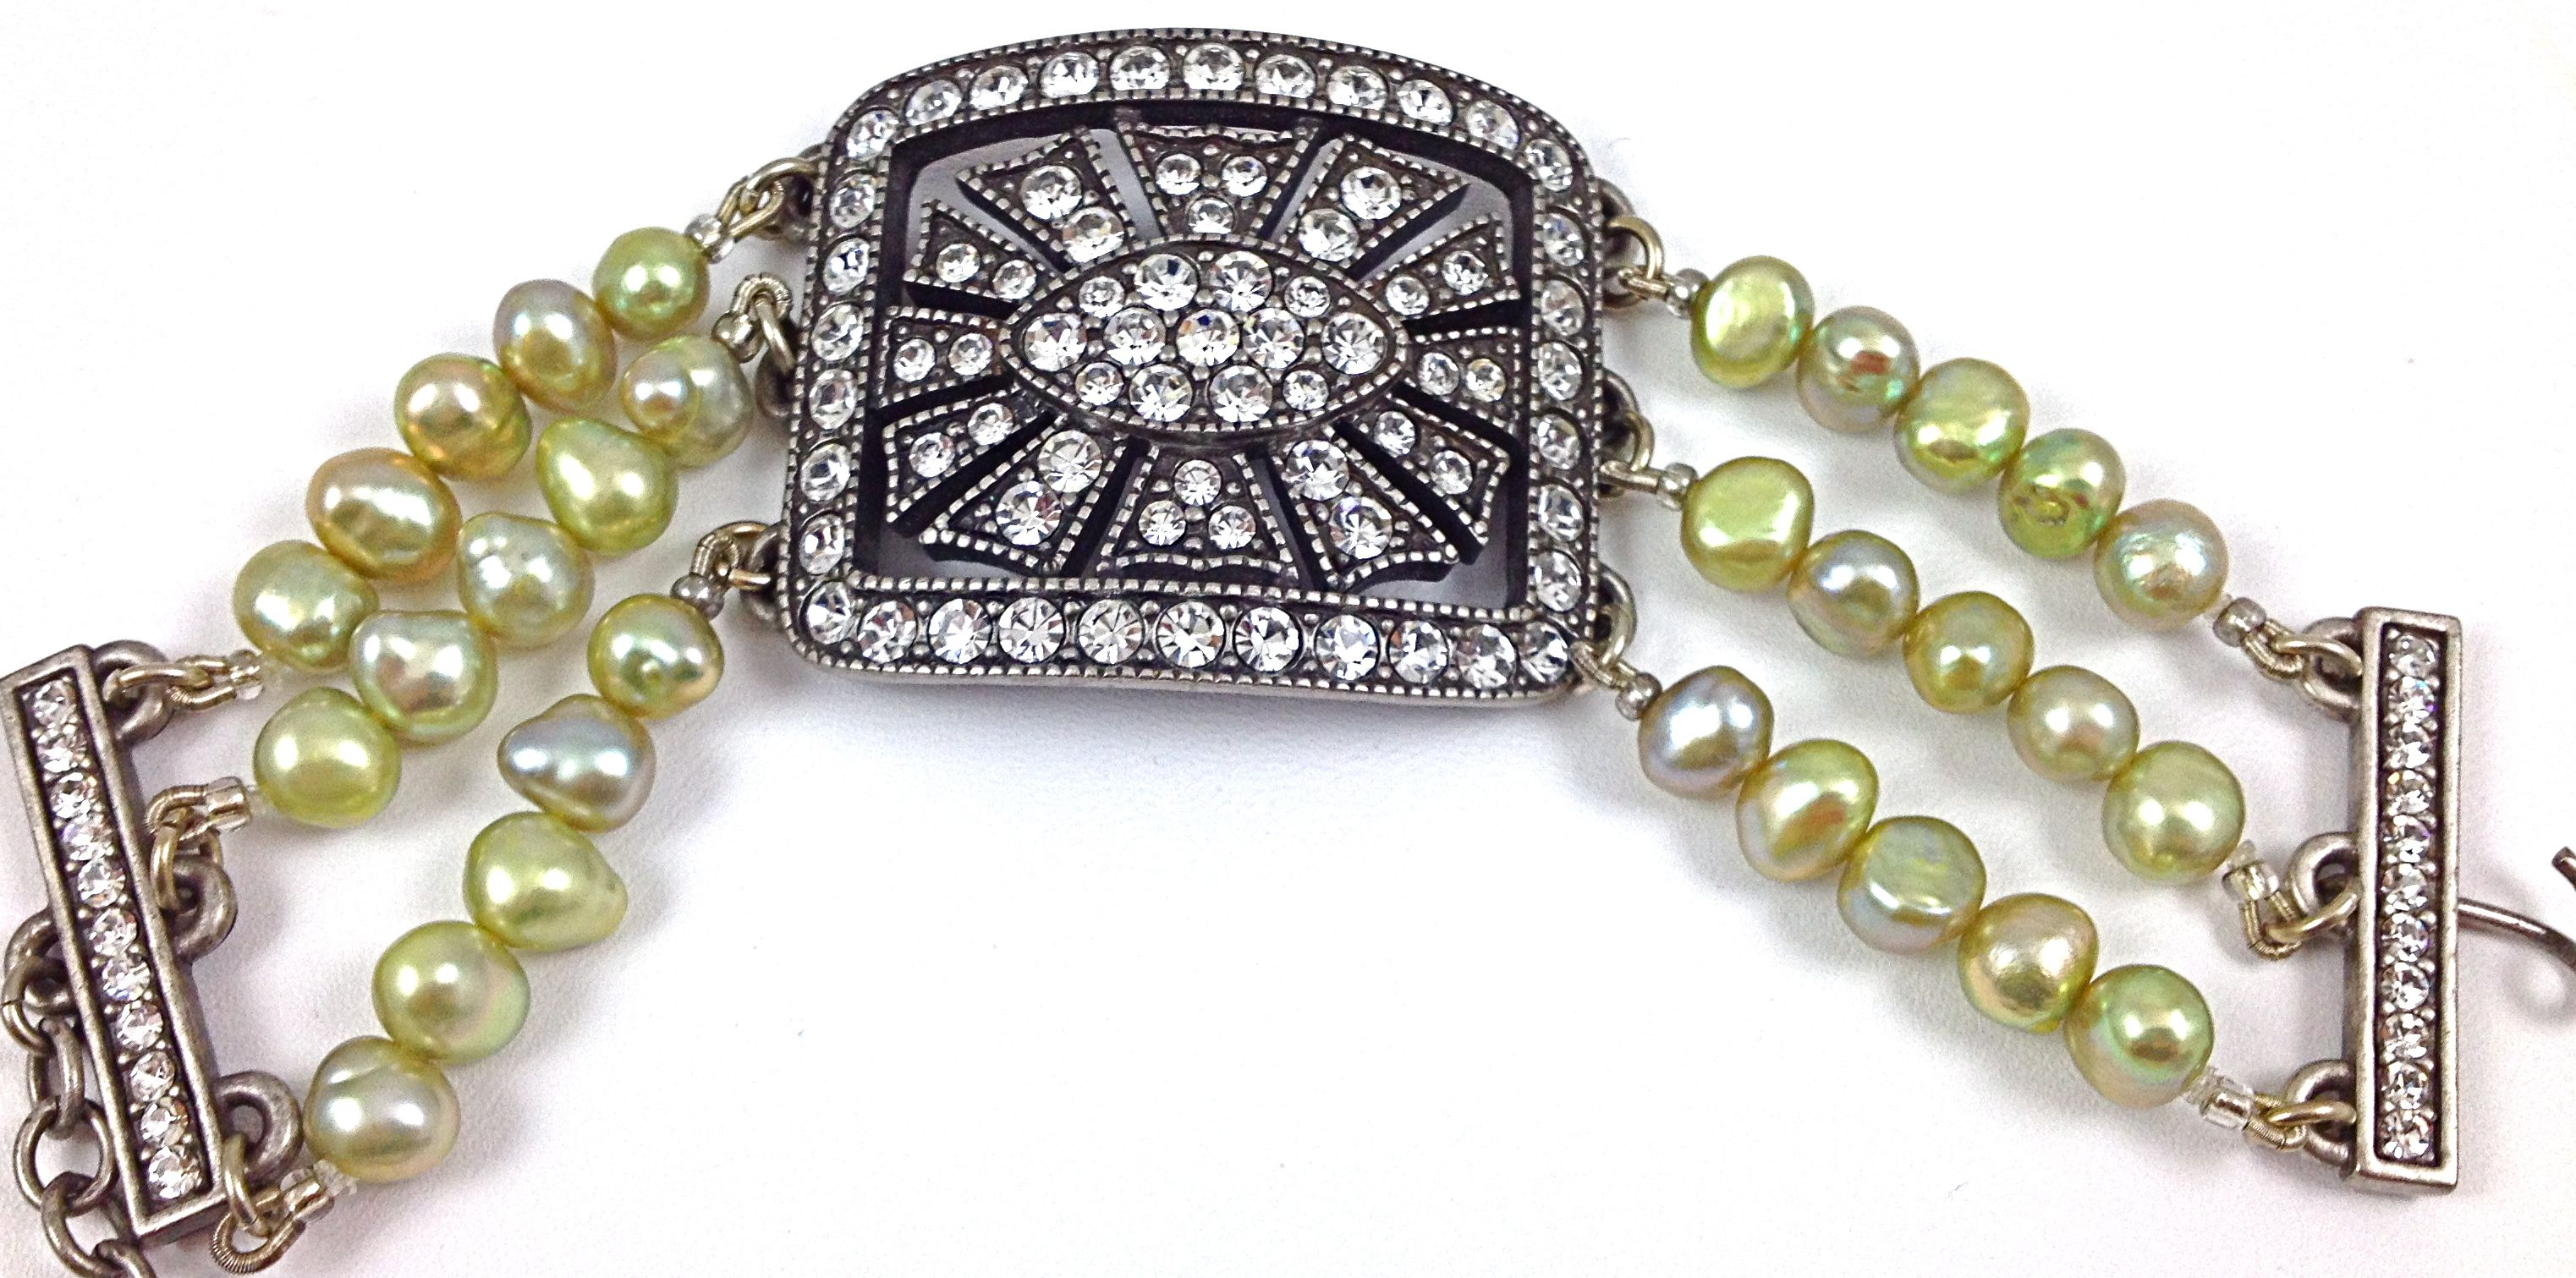 Swarovski Crystal Green Pearl Bracelethttp://stores.lauraleeds.comSwarovski Crystal Green Pearl BraceletL